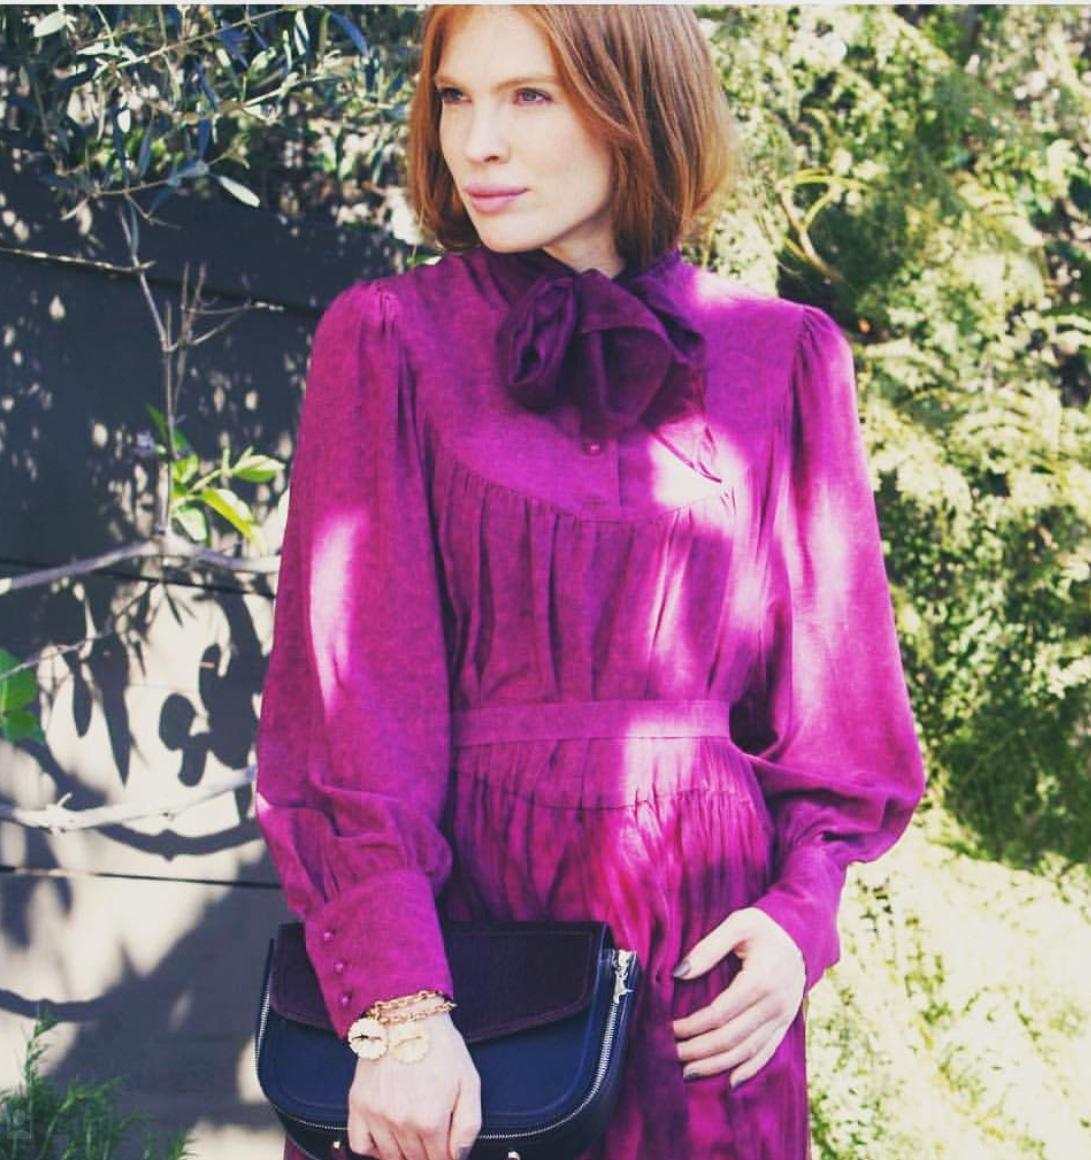 Gigi Thoenes, German super-model, spending time in LA, California looking stunning in Valentina & Valentia silk chiffon dress.